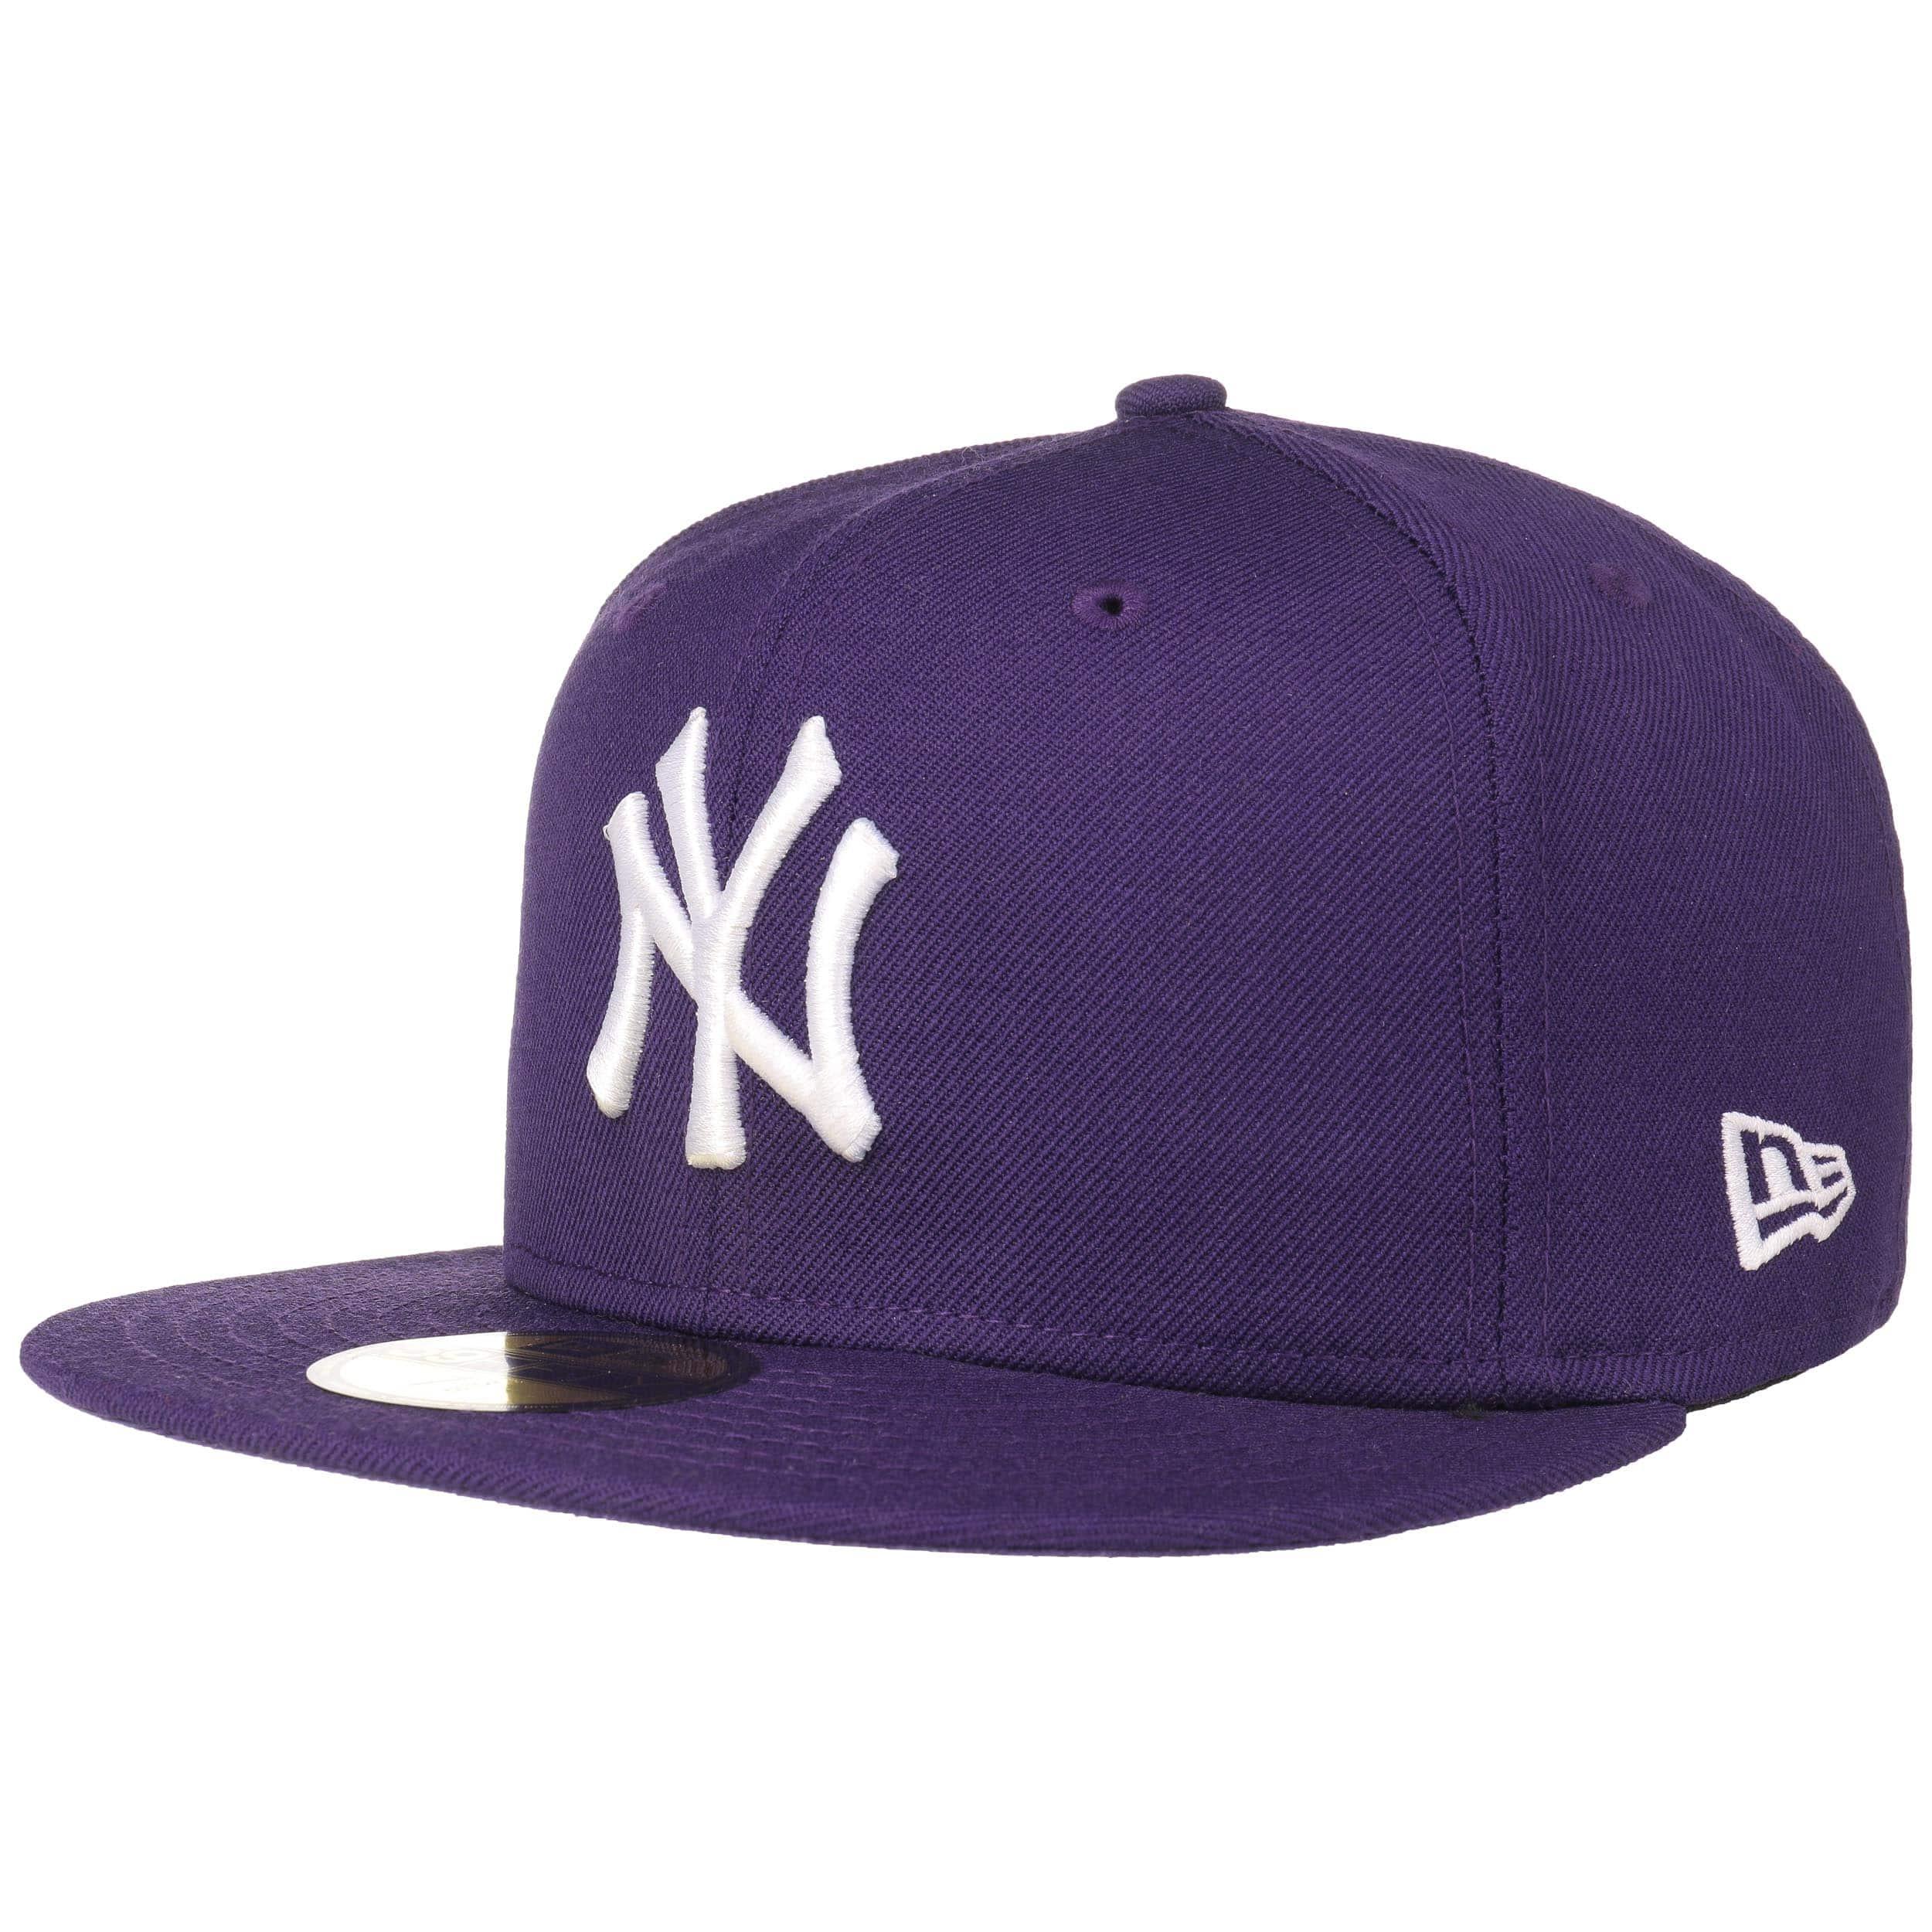 765e560e033fc 59Fifty Gorra MLB Basic NY by New Era - Gorras - sombreroshop.es